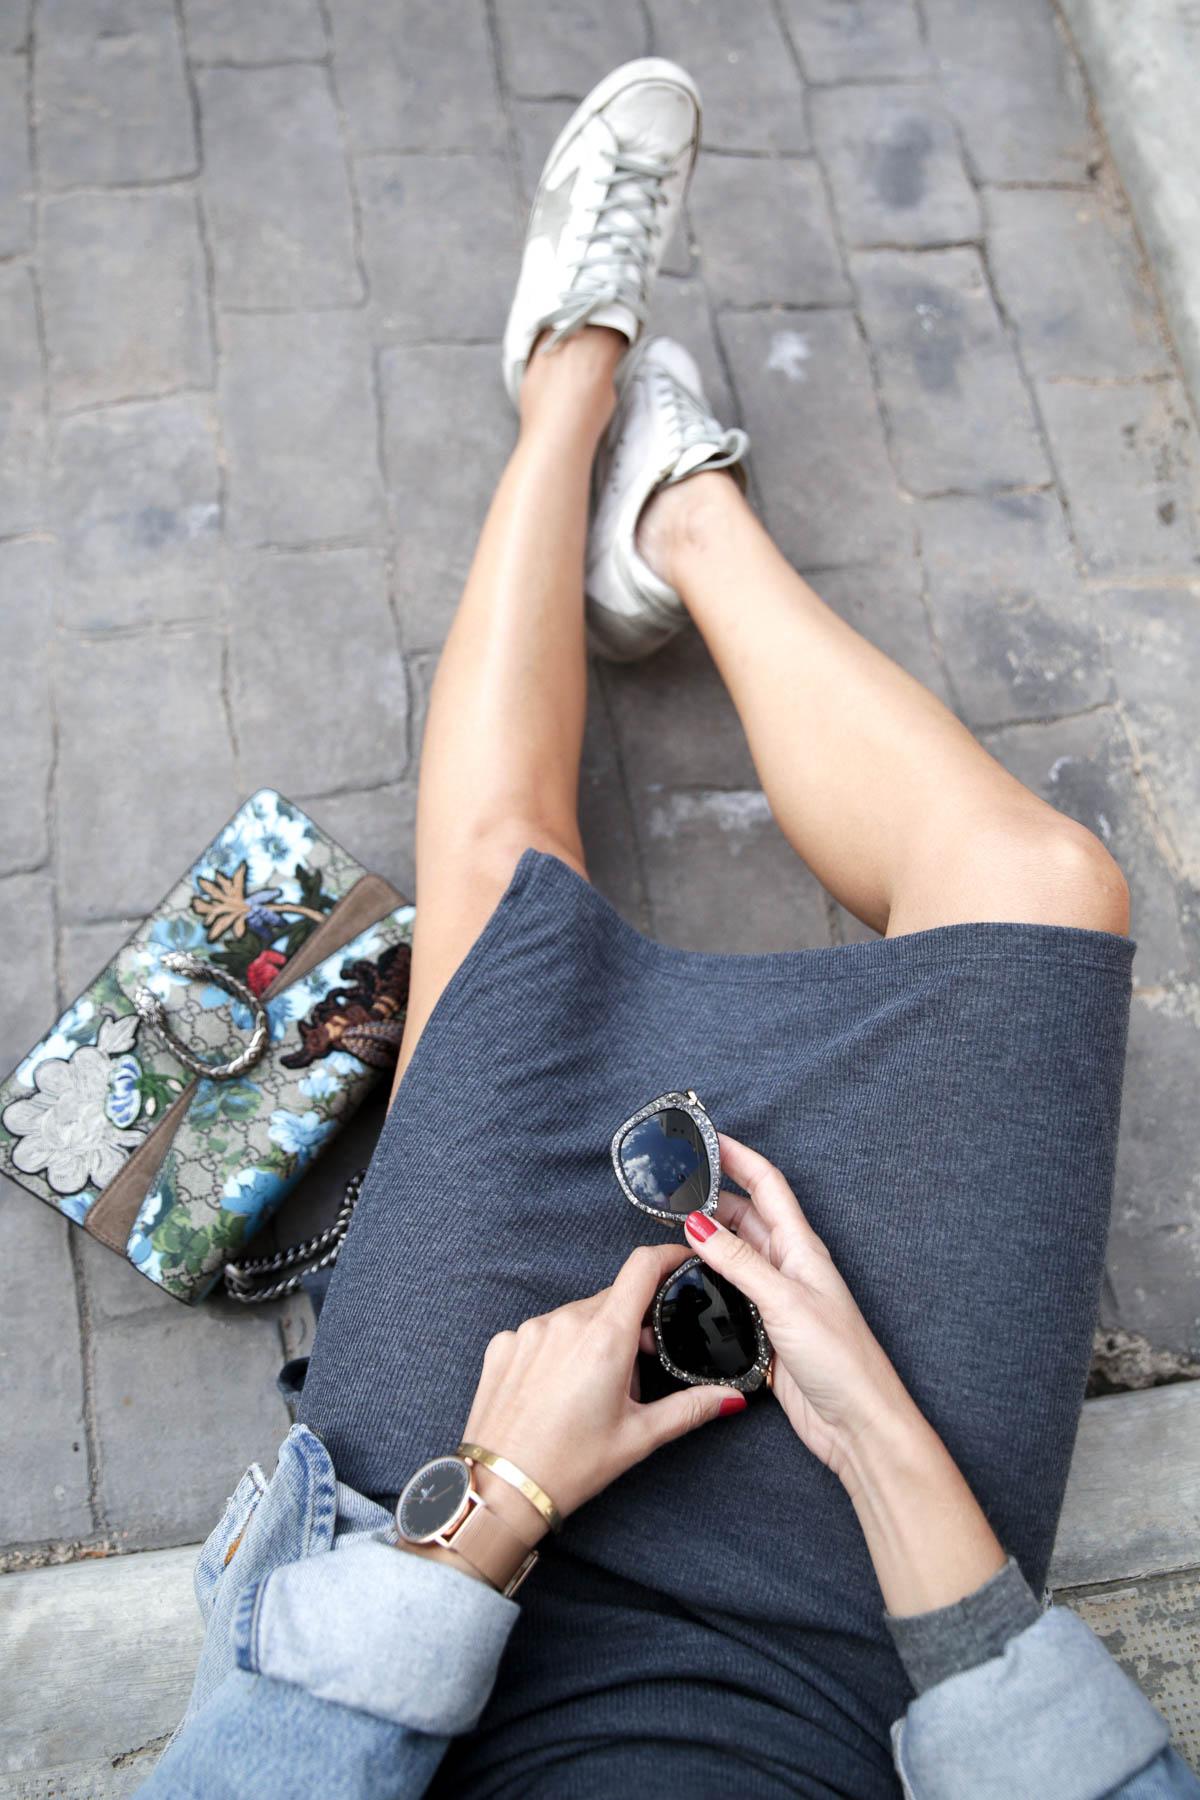 black-friday-a-bicyclette-sweatshirt-hoodie-all-star-leather-piel-cuero-celine-bag-bolso-mini-skirt-falda-streetstyle-look-bartabac-outfit-moda-blogger-22